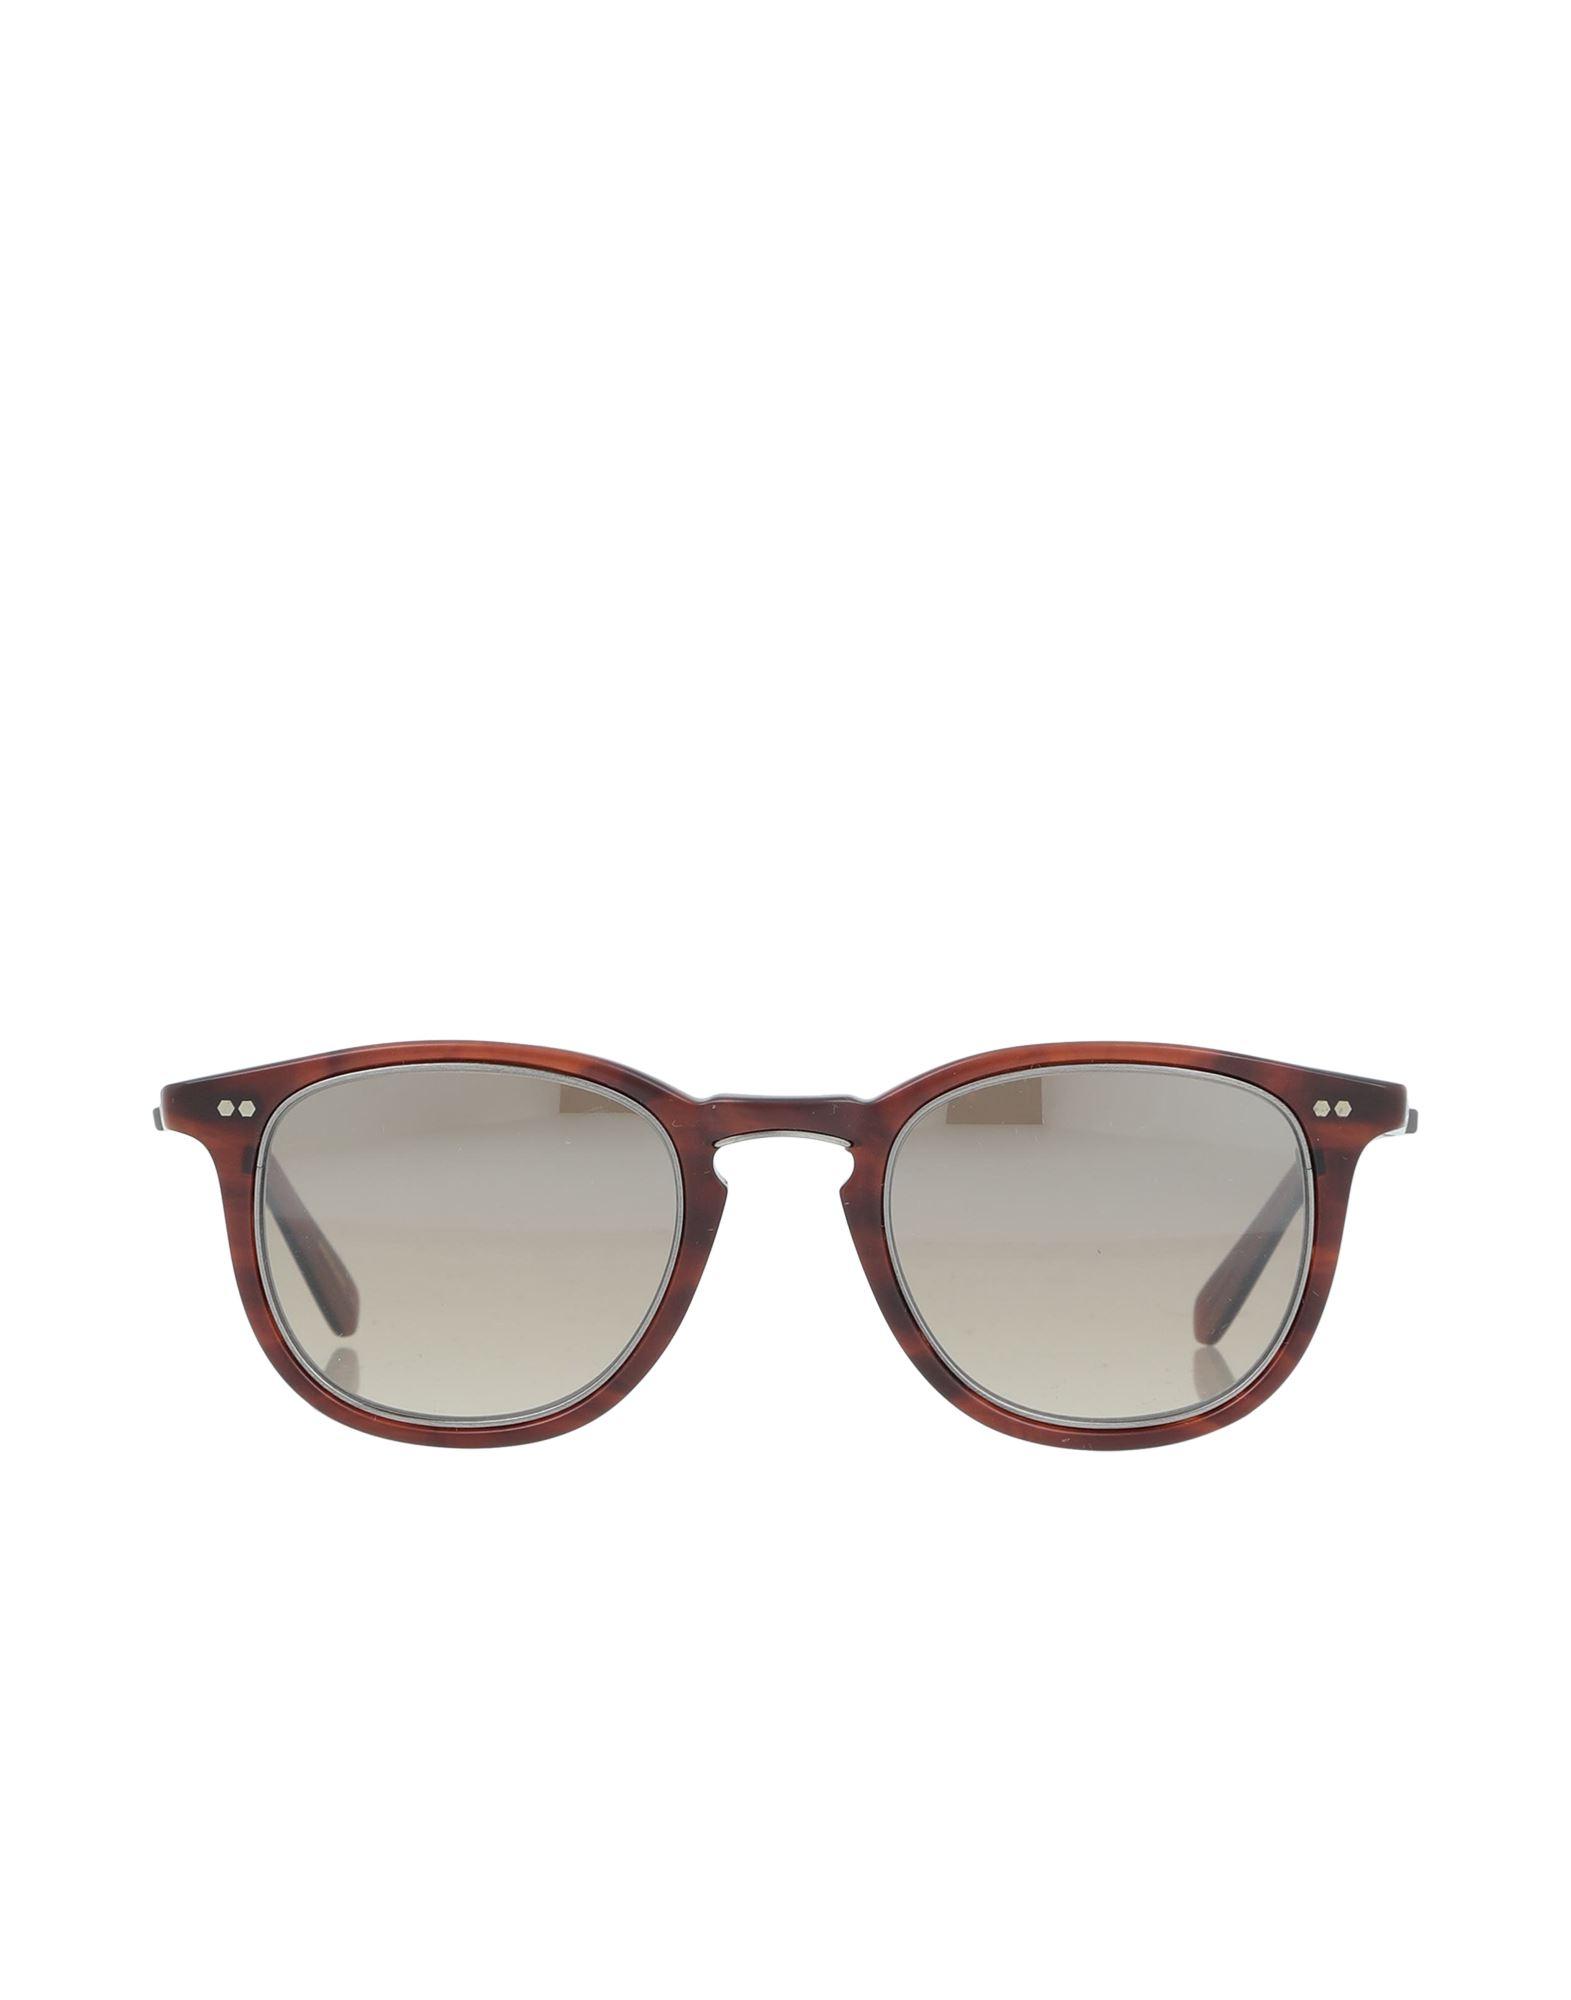 MR. LEIGHT Sunglasses - Item 46752968